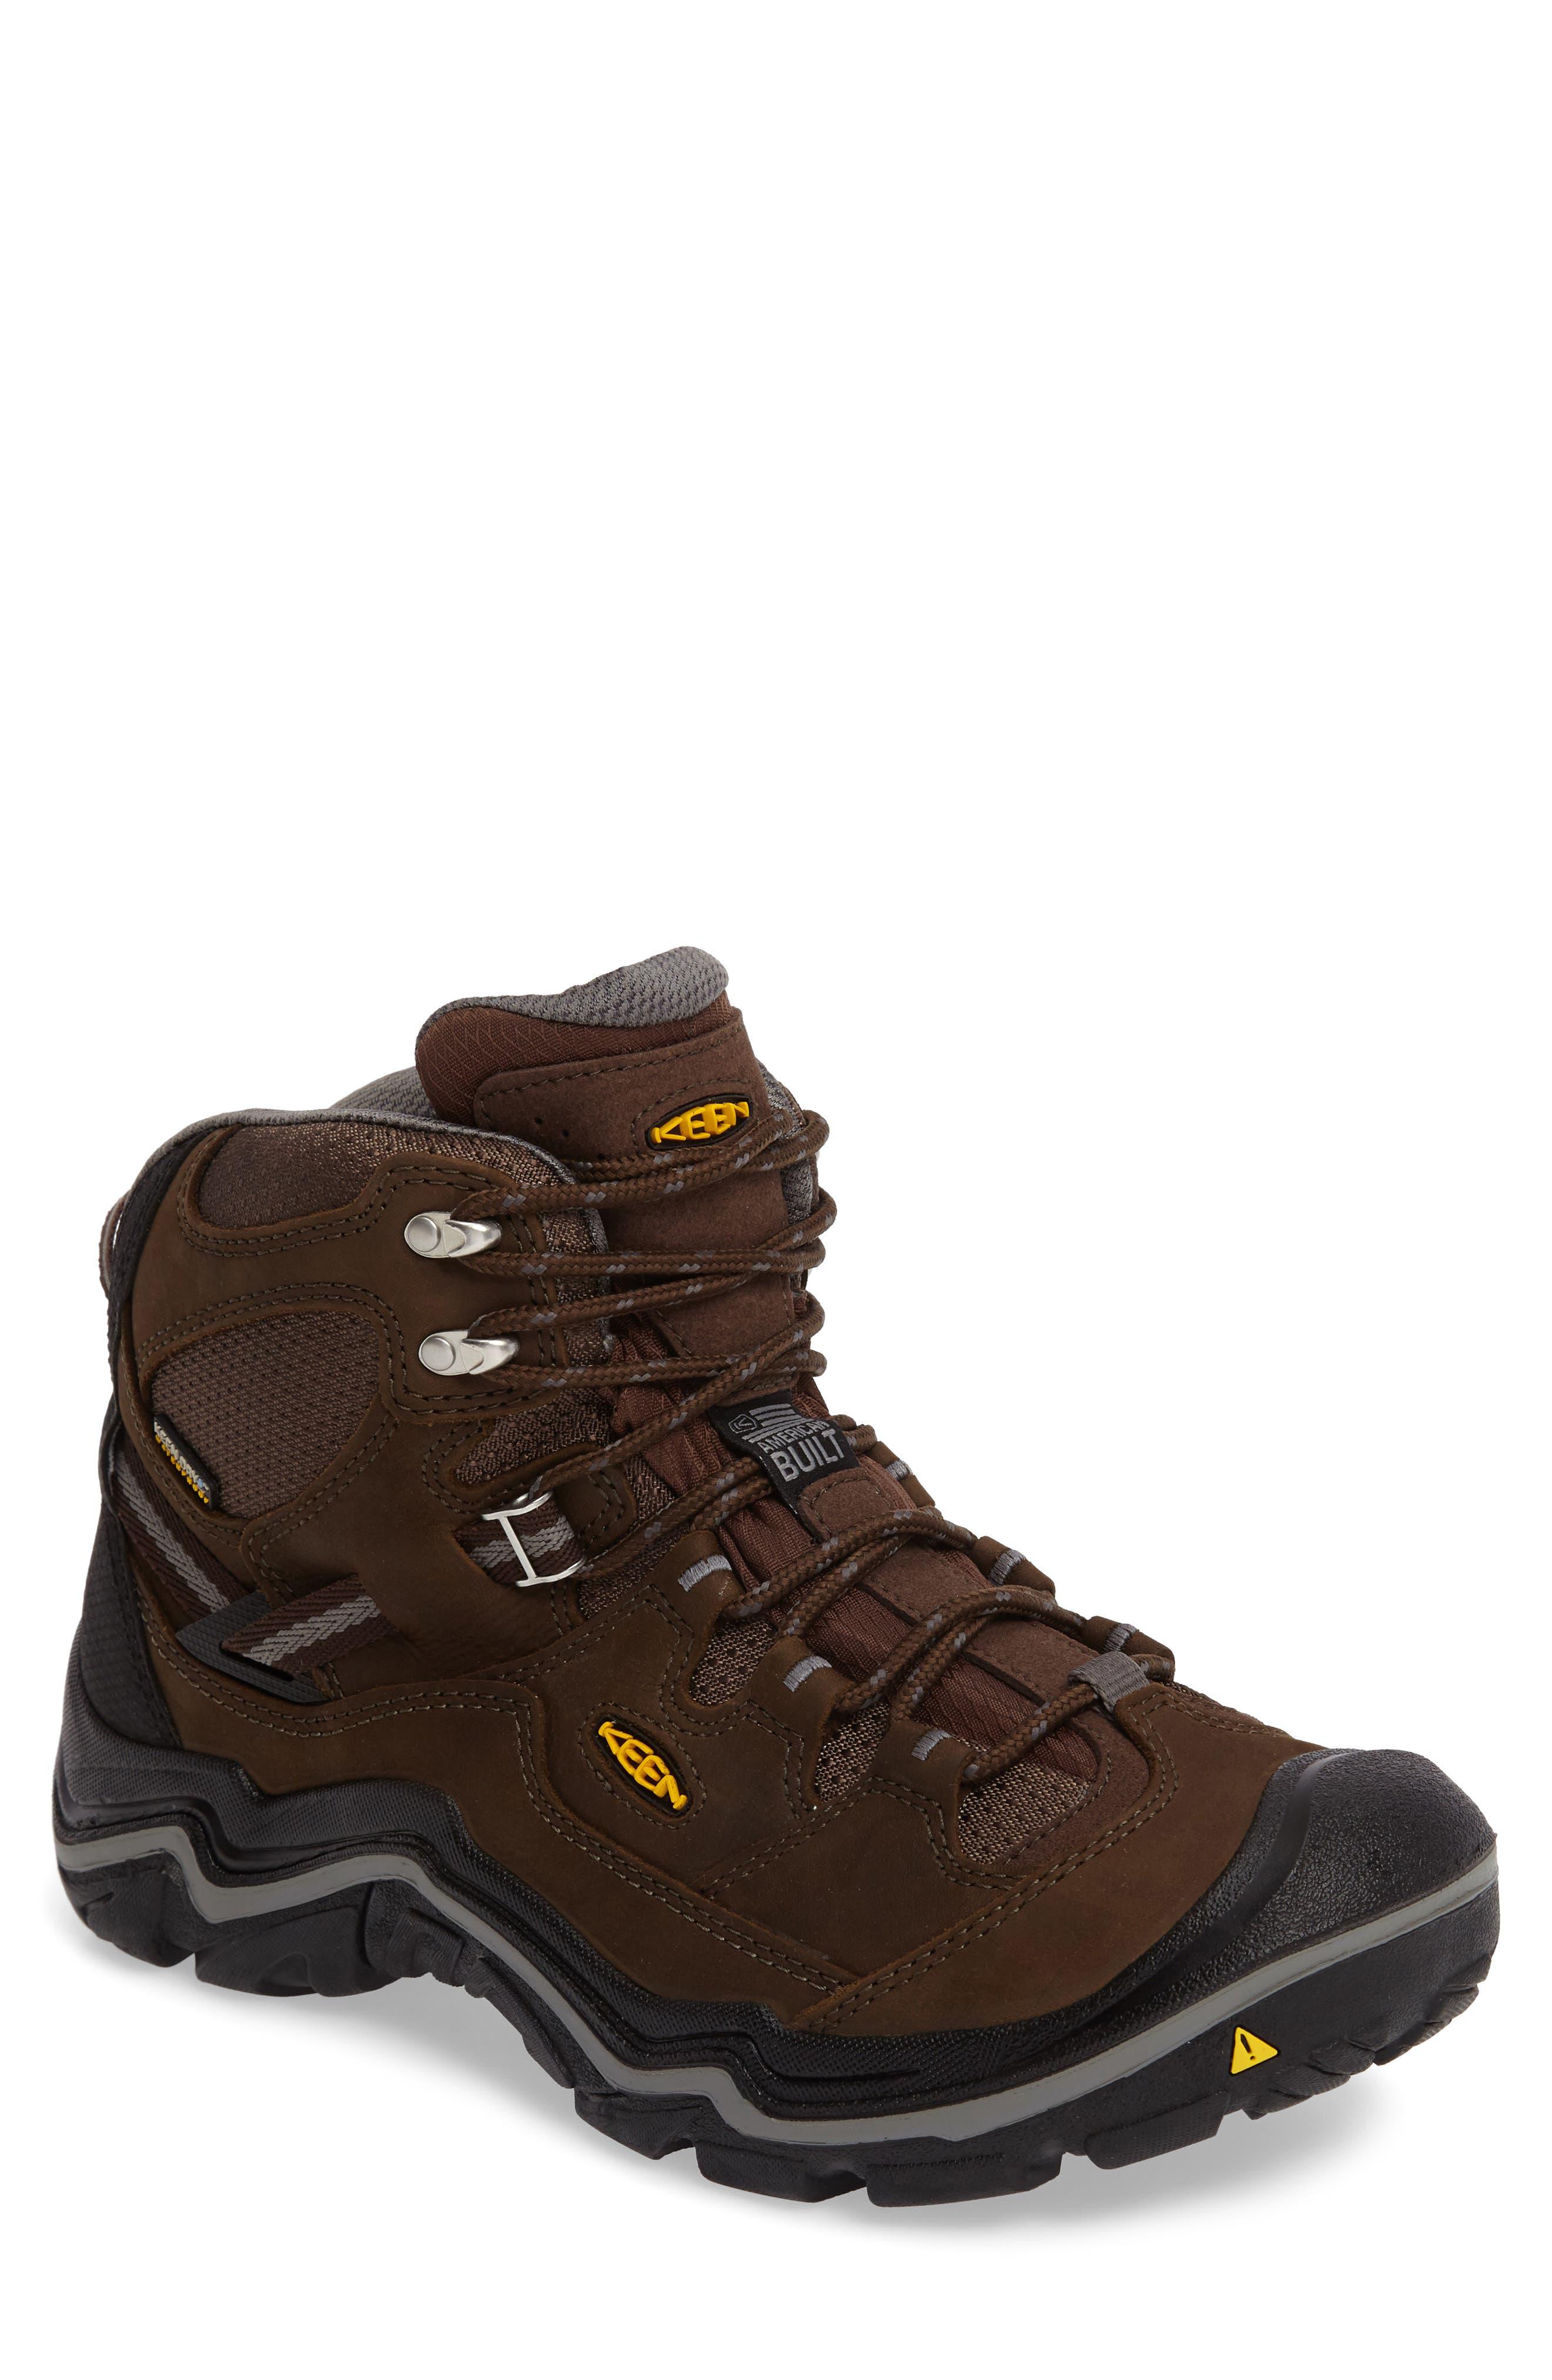 KEEN Durand Mid Waterproof Hiking Boot